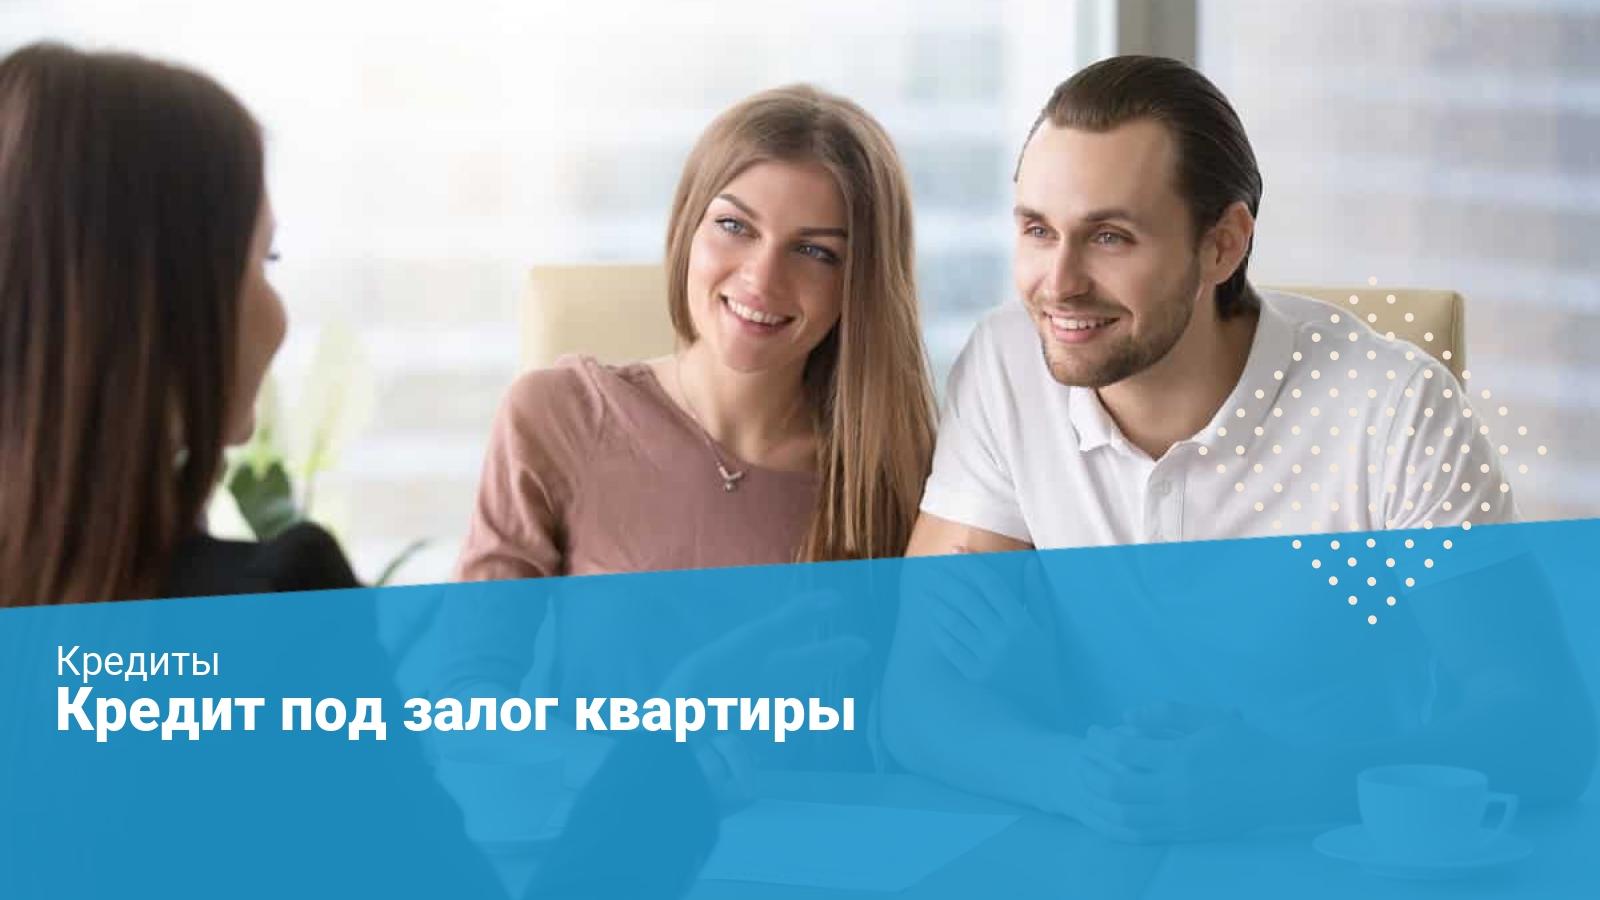 кредит под залог квартиры срочно